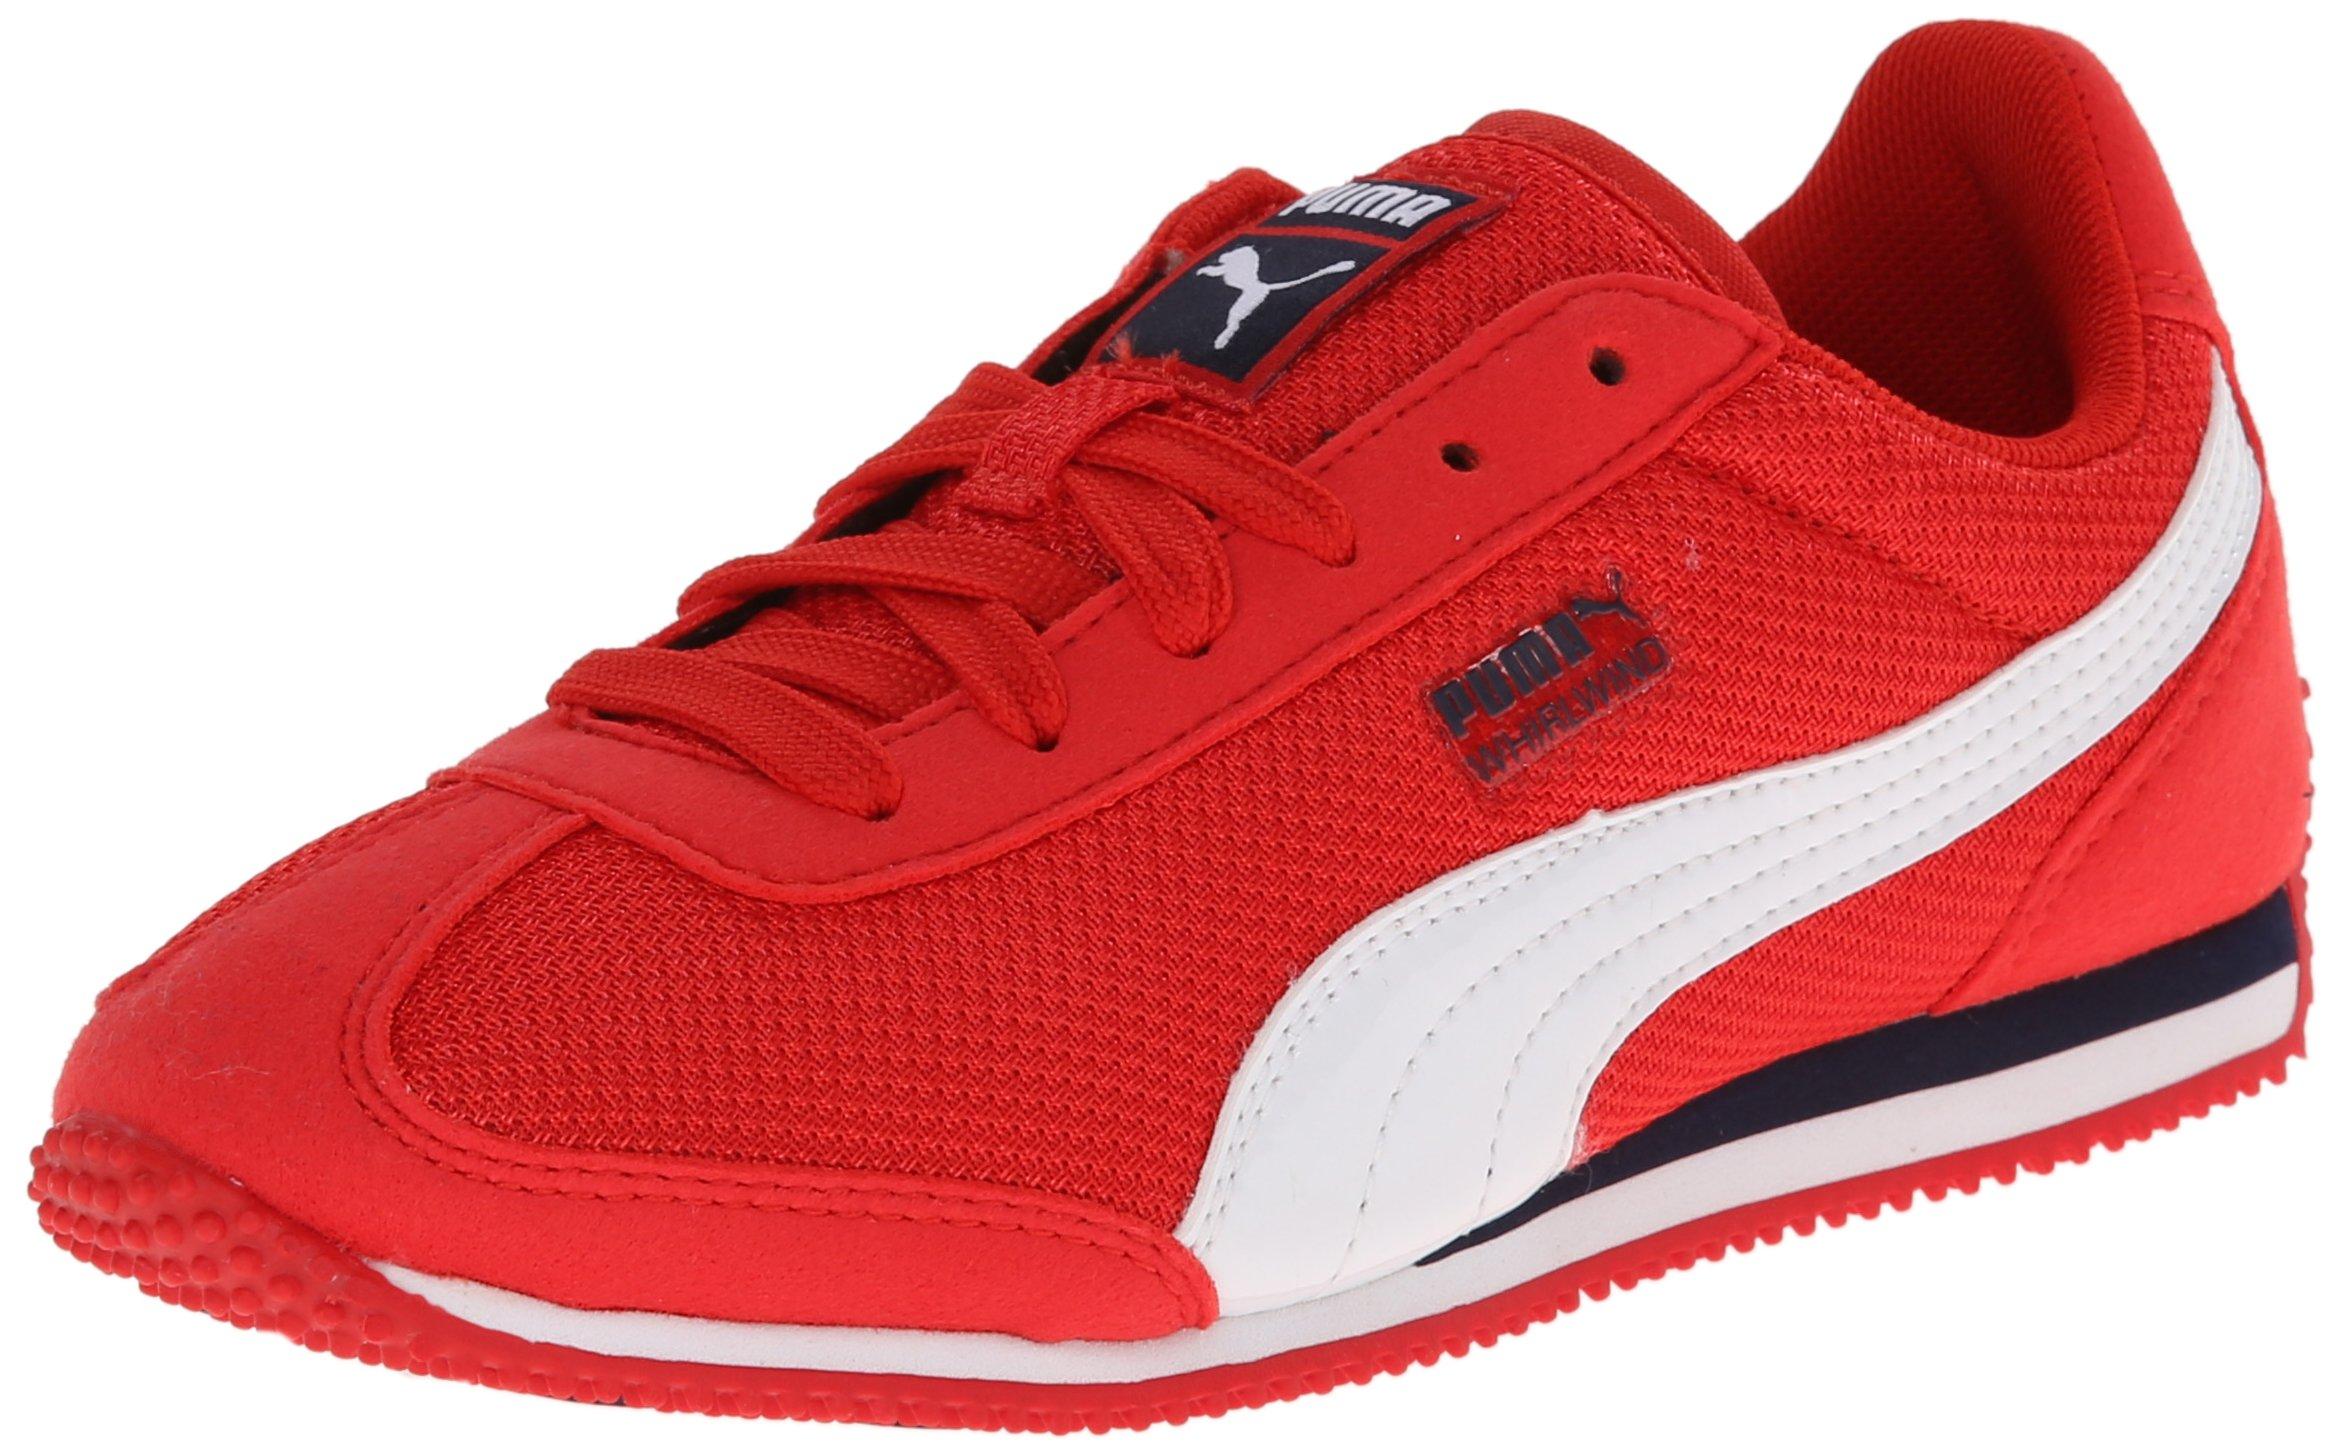 PUMA Whirlwind Mesh JR Sneaker (Little Kid/Big Kid), High Risk Red/White/Peacoat, 12.5 M US Little Kid